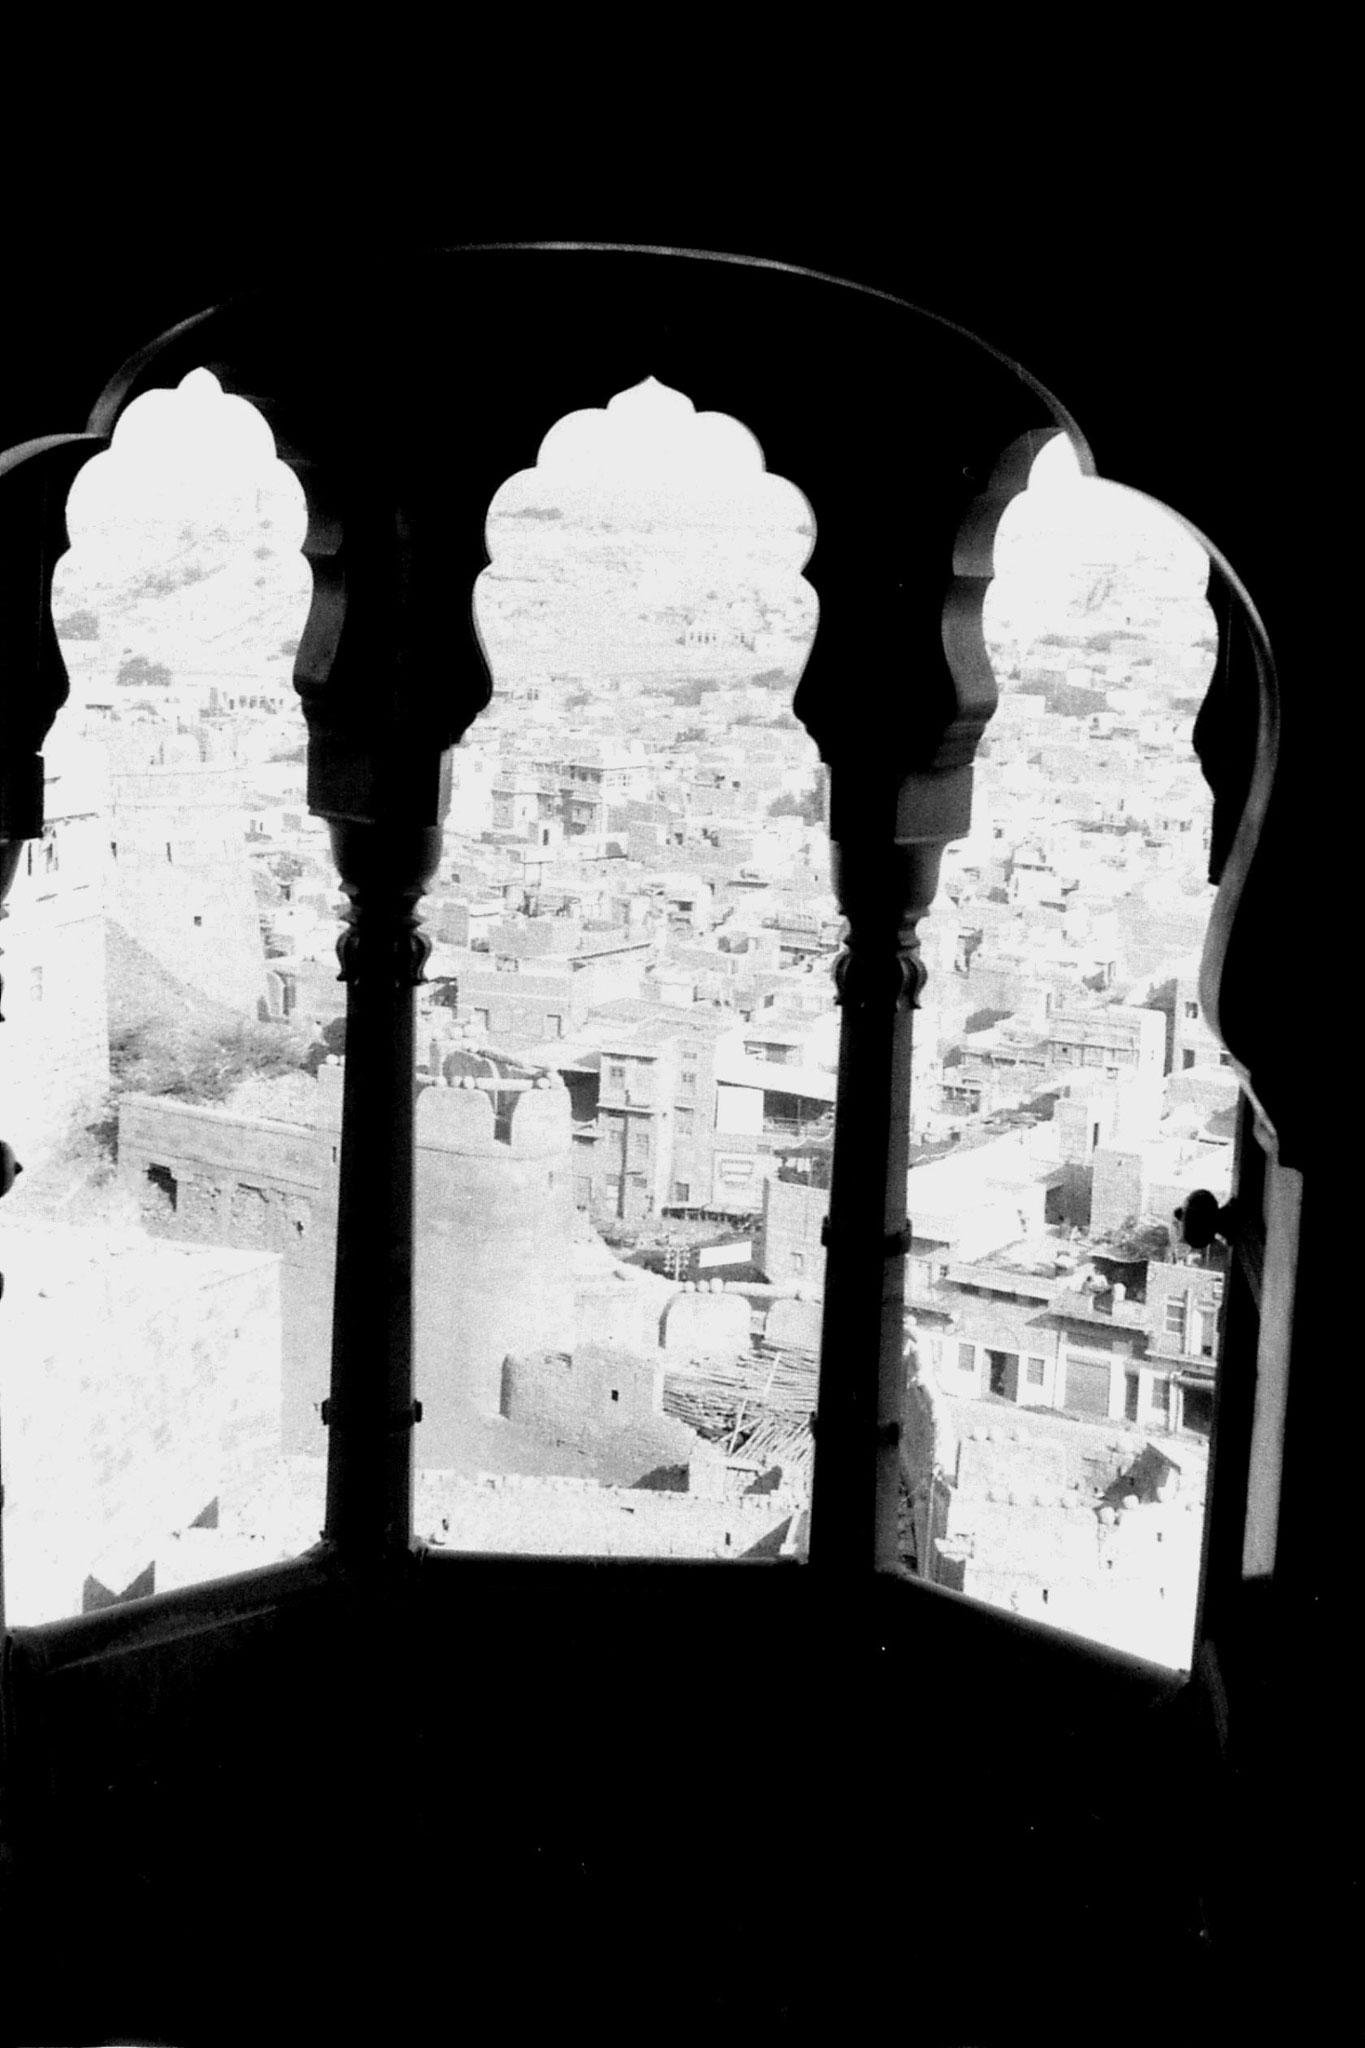 3/12/1989: 20: Jaisalmer, Fort and town through window